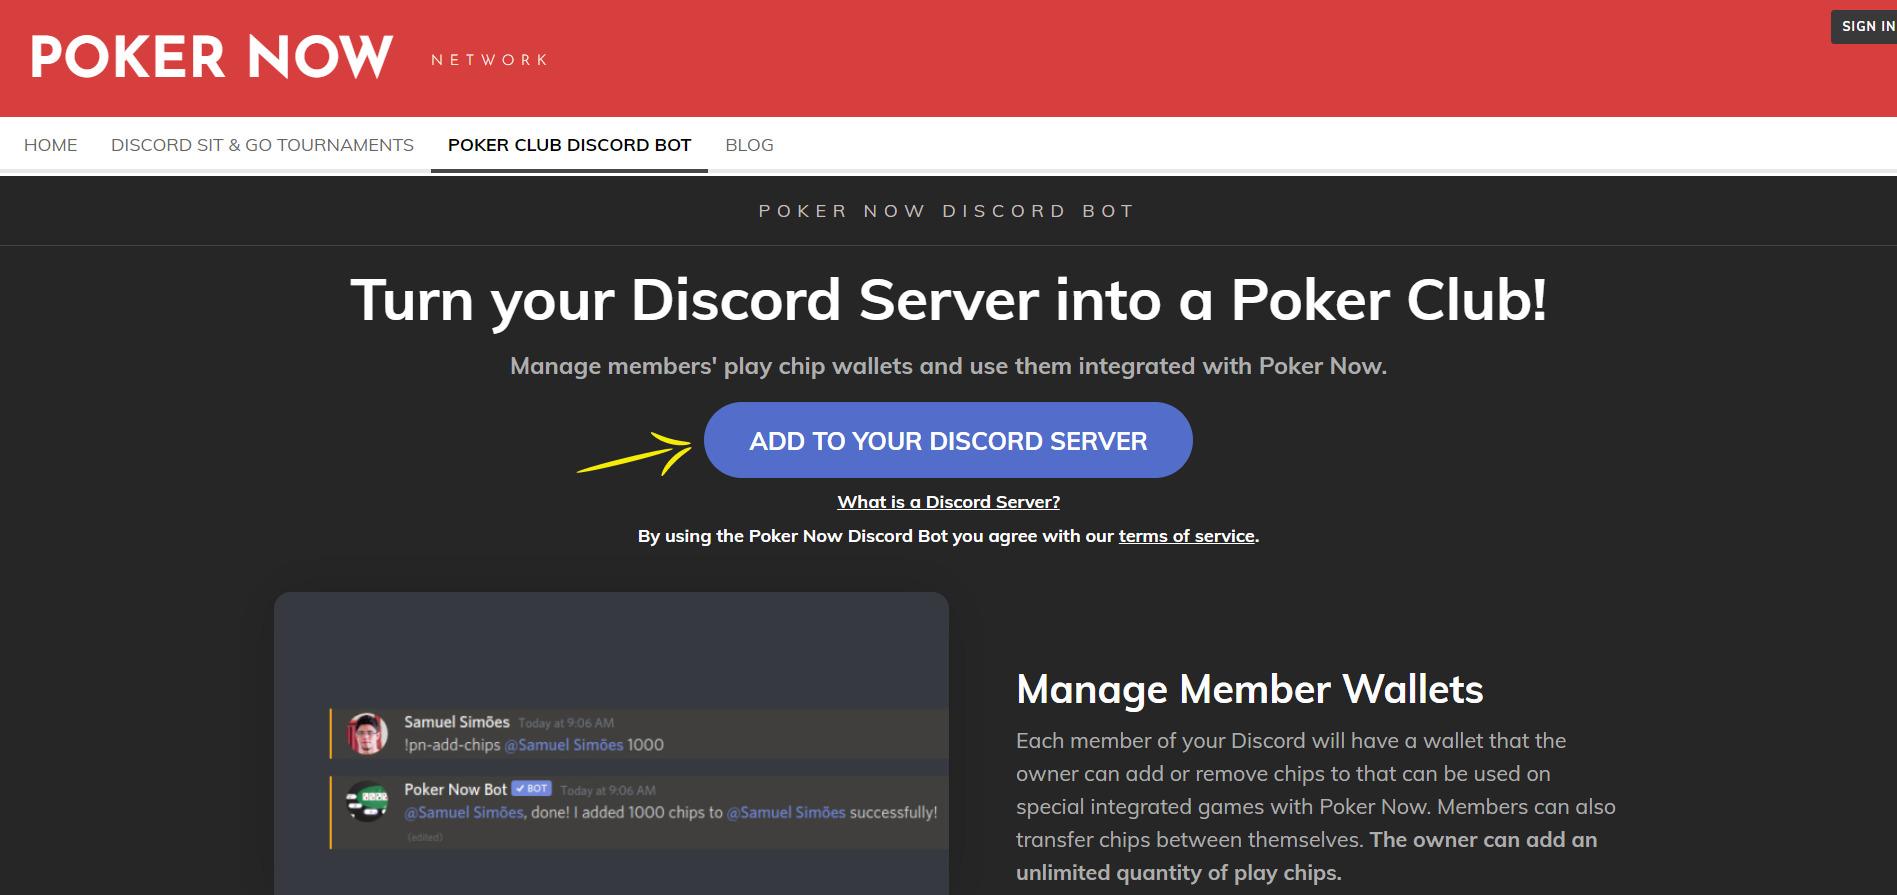 Adding Poker Now bot on your Discord Server